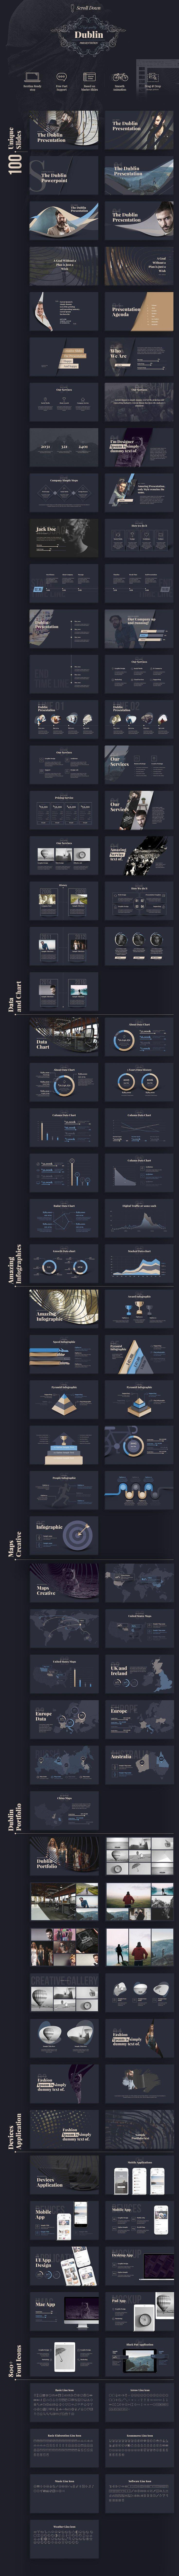 Elegant dark PowerPoint slide presentation template in navy and gold ...